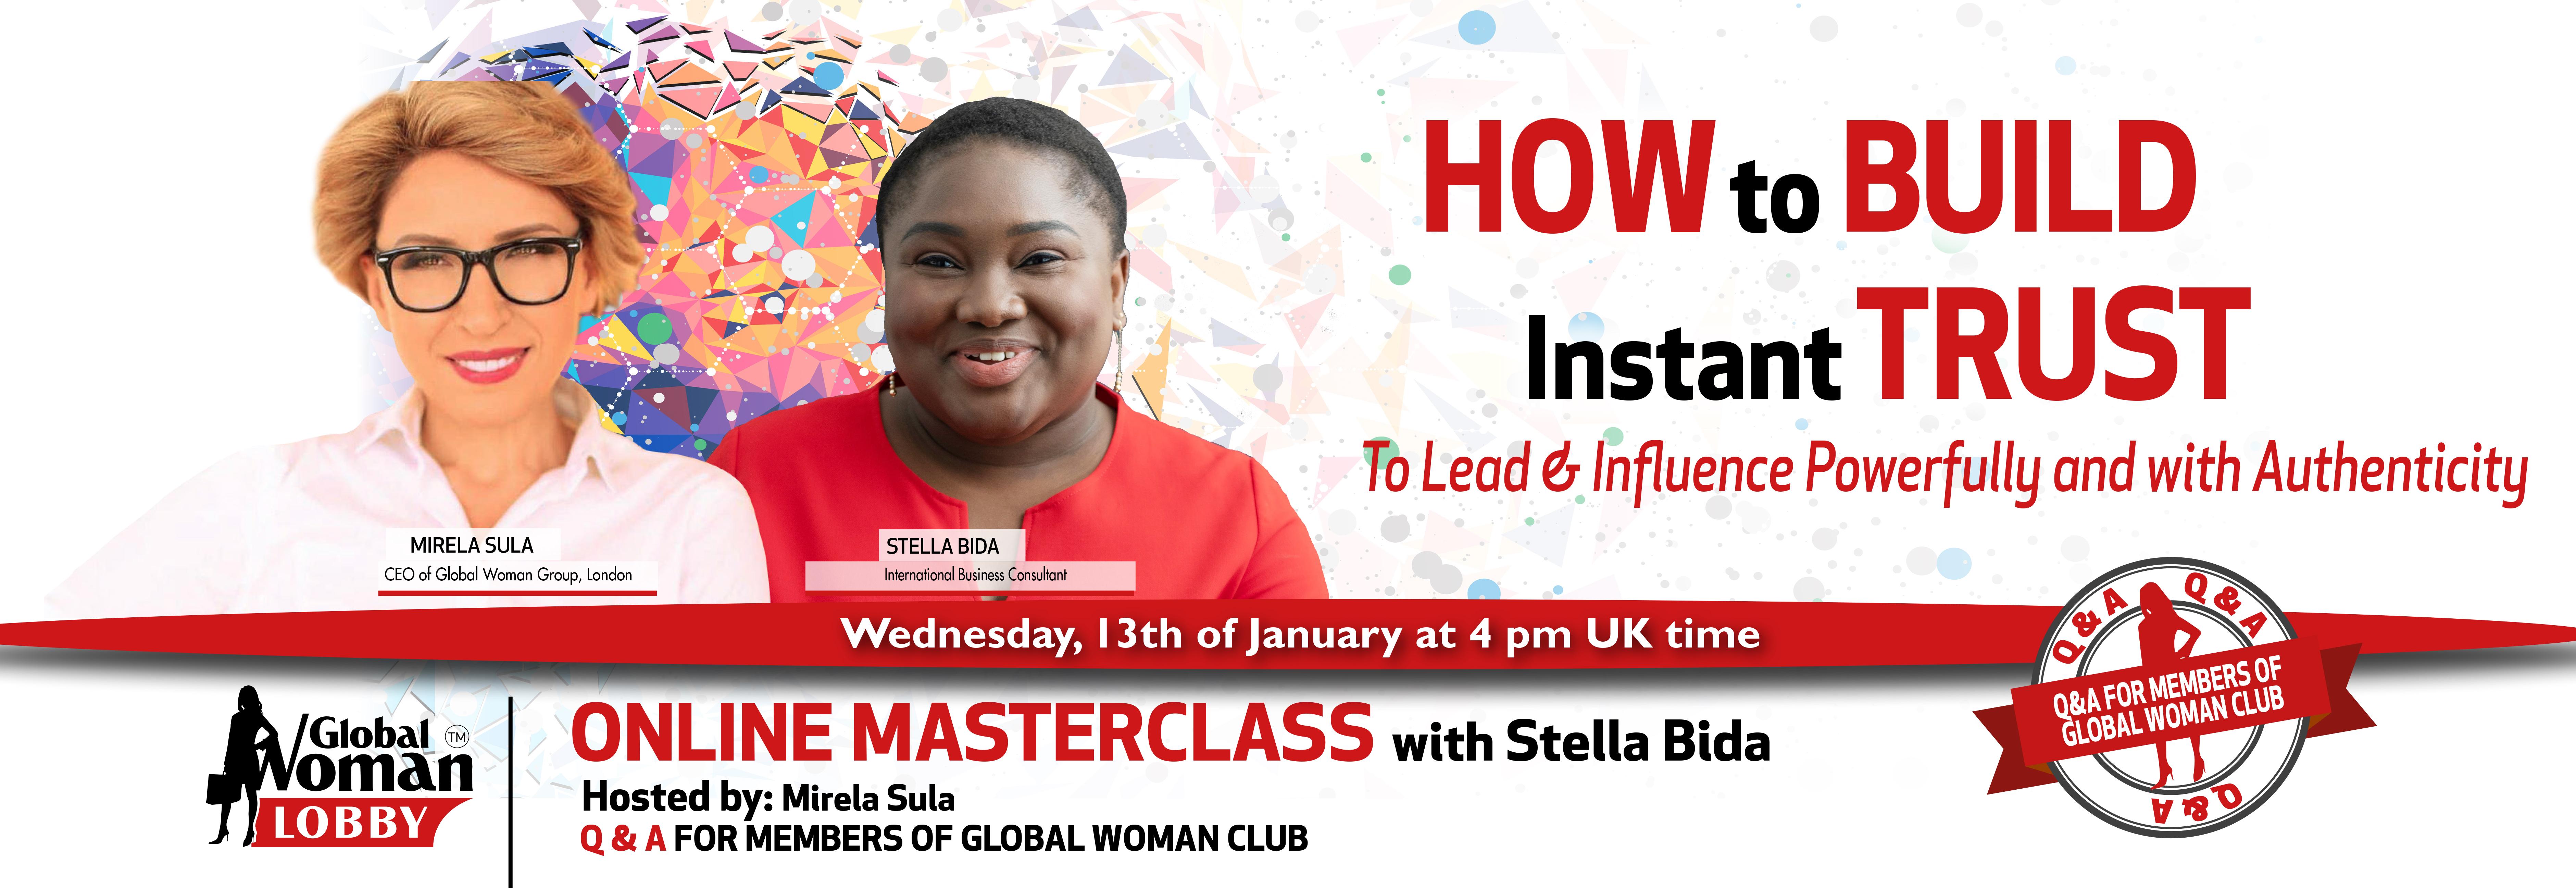 Online Masterclass with Stella Bida